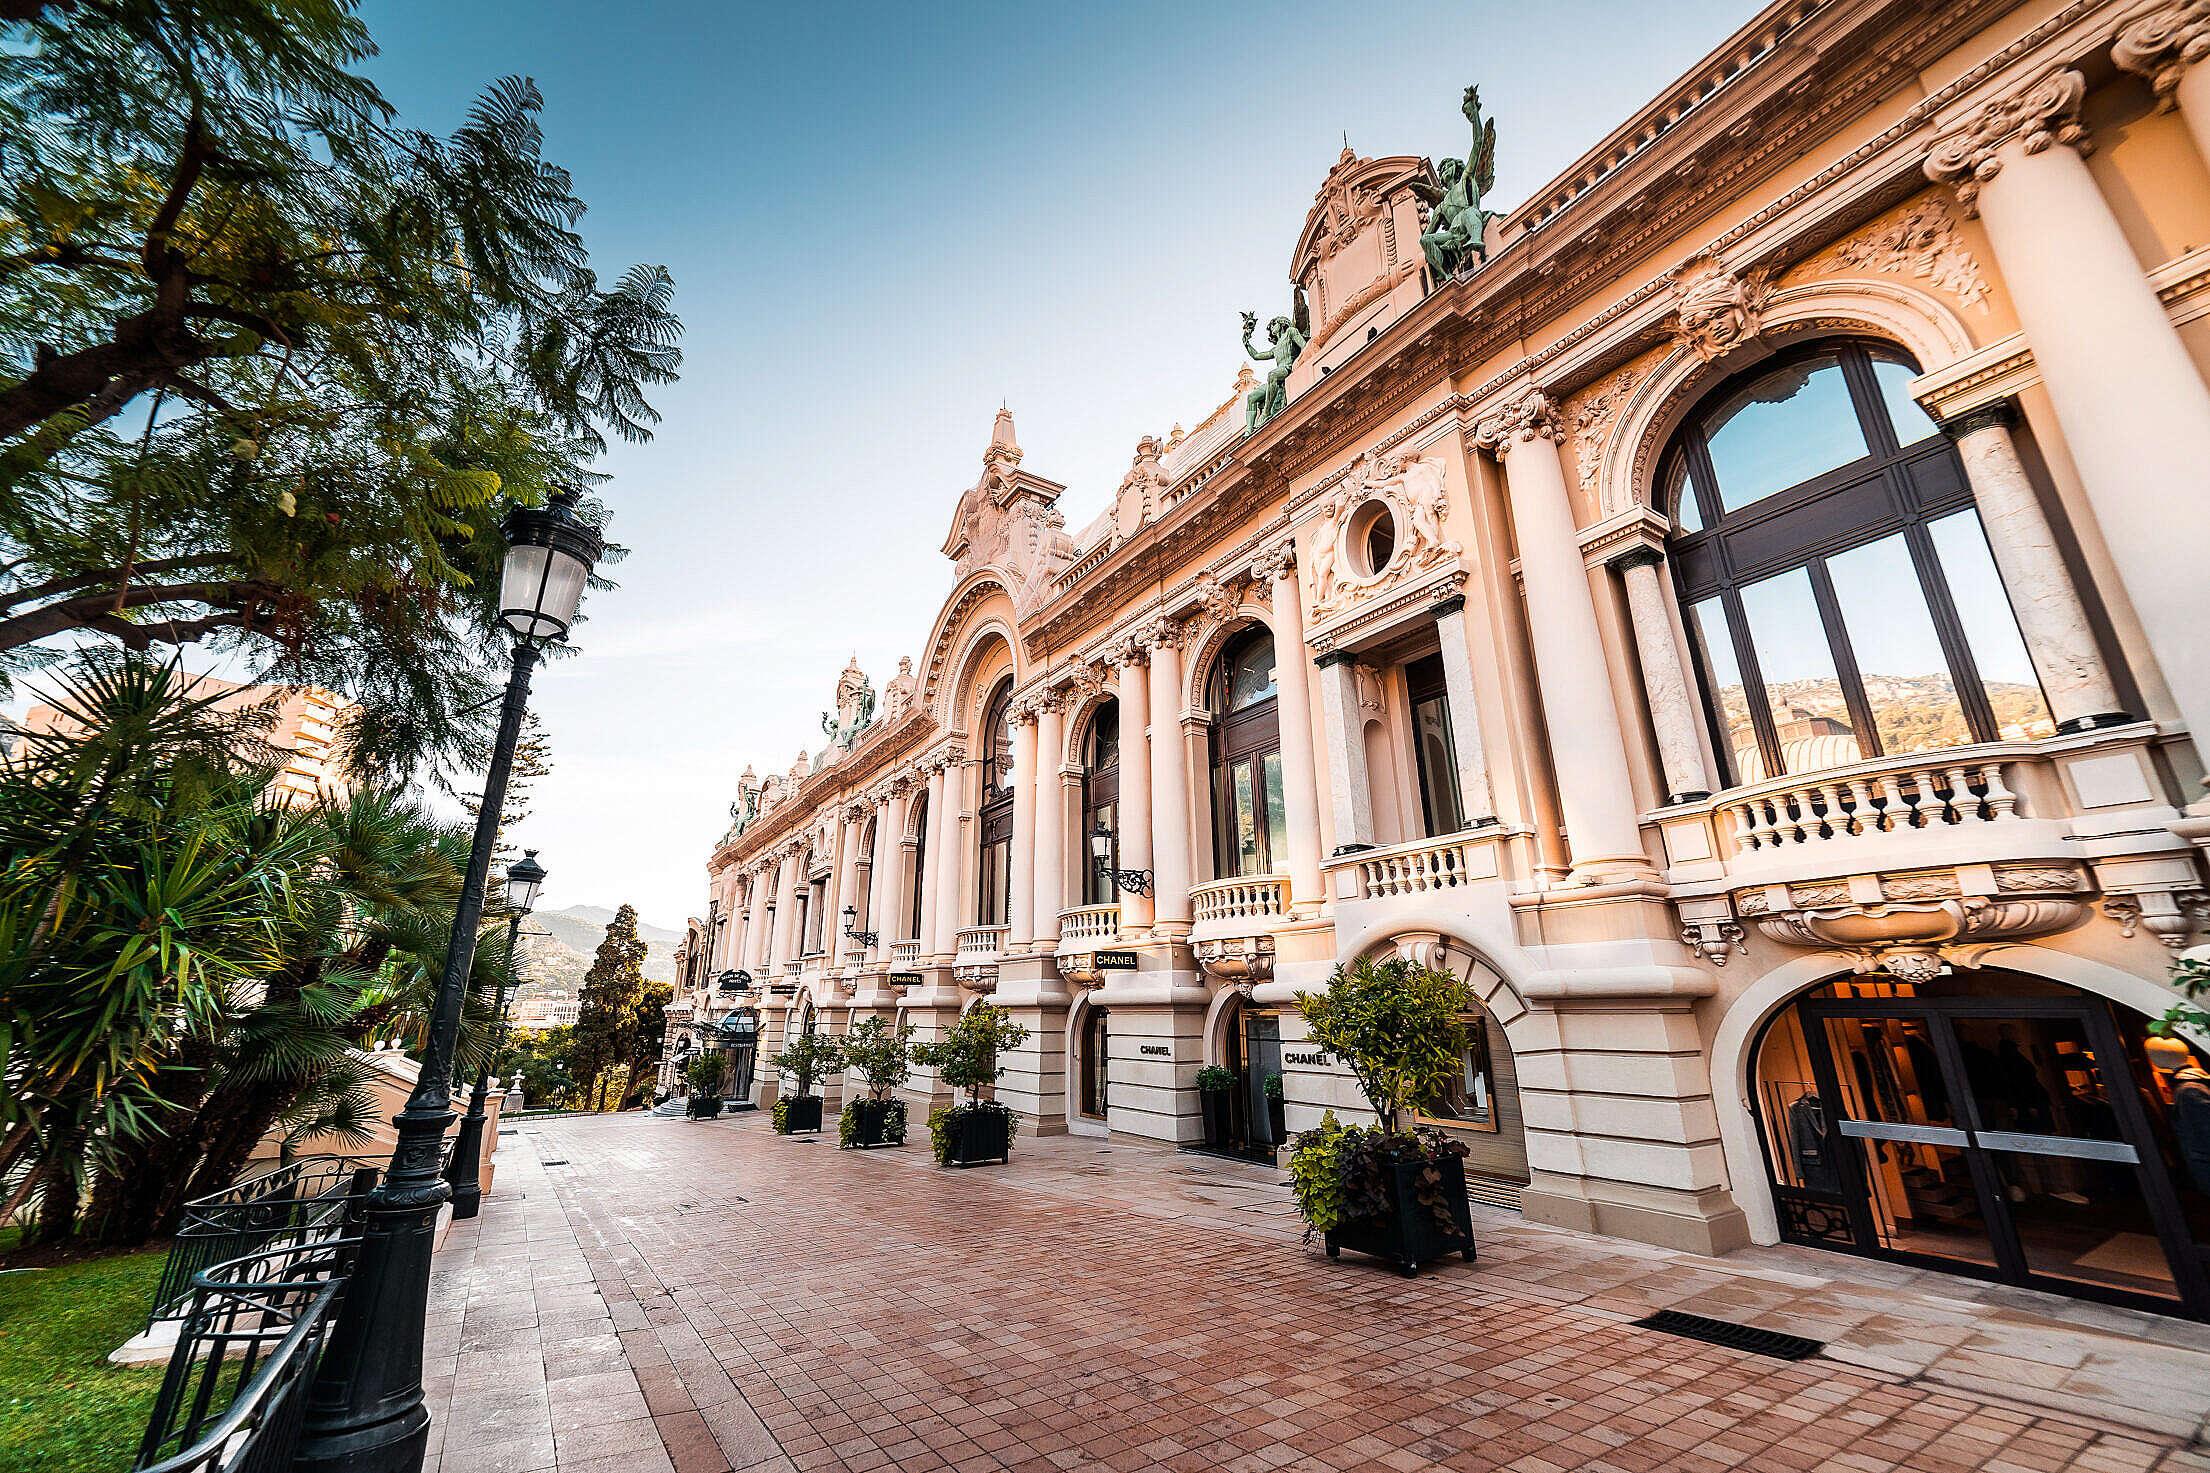 Luxury Stores in Monaco Monte Carlo Free Stock Photo